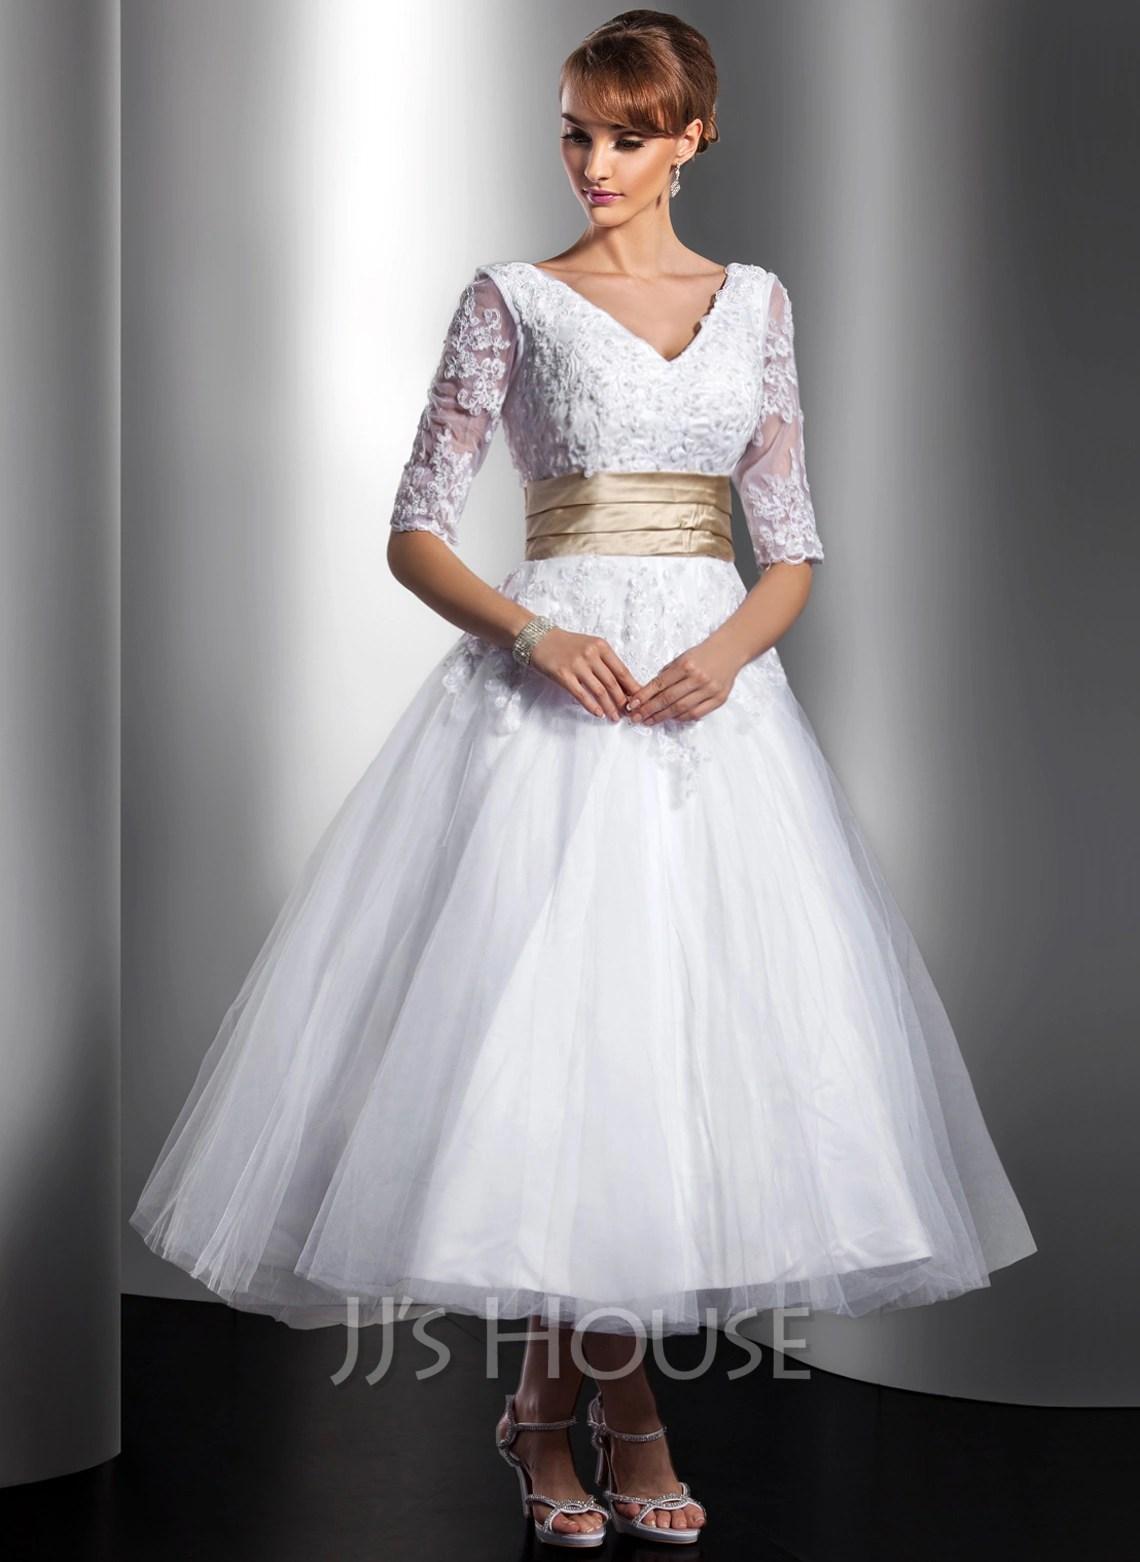 A Line Princess V Neck Tea Length Tulle Wedding Dress With Sash Beading Appliques Lace g jjshouse wedding dress Home Wedding Dresses Loading zoom